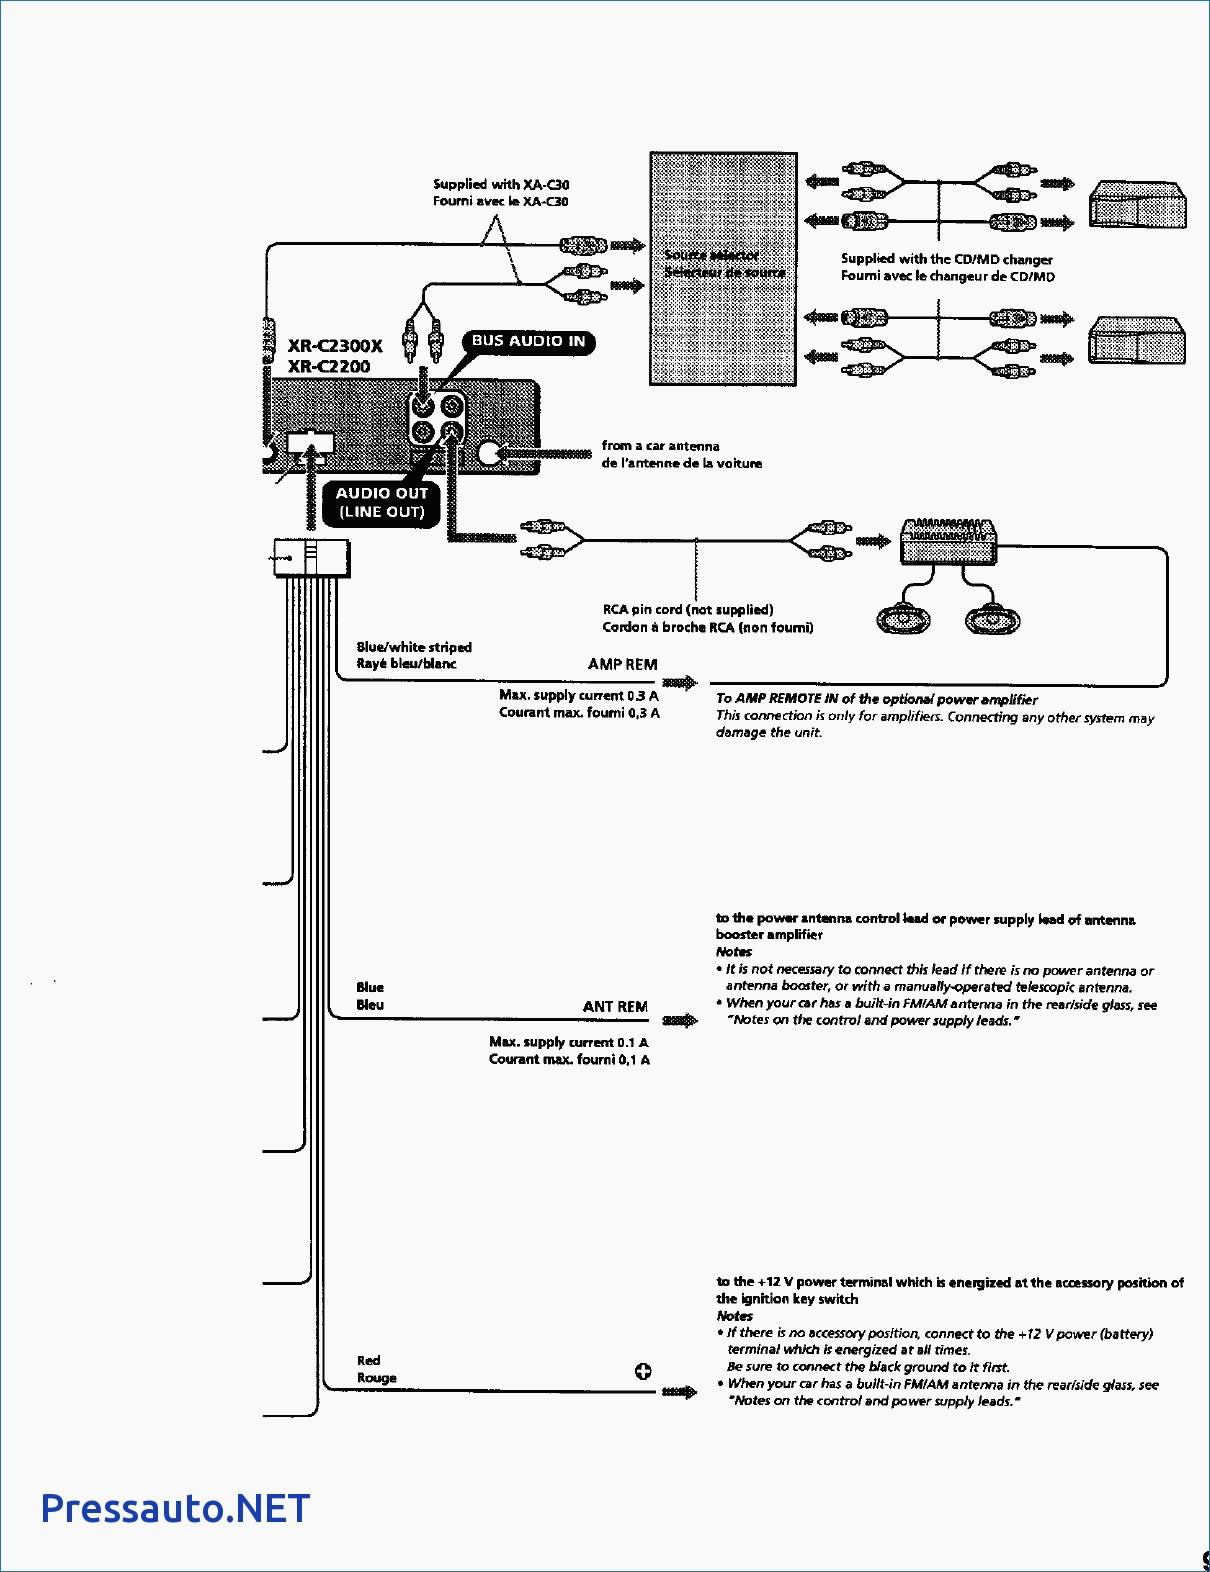 Sony Xplod Wiring Diagram On Sony M 610 Wiring Harness Diagram - Sony Xplod Wiring Harness Diagram